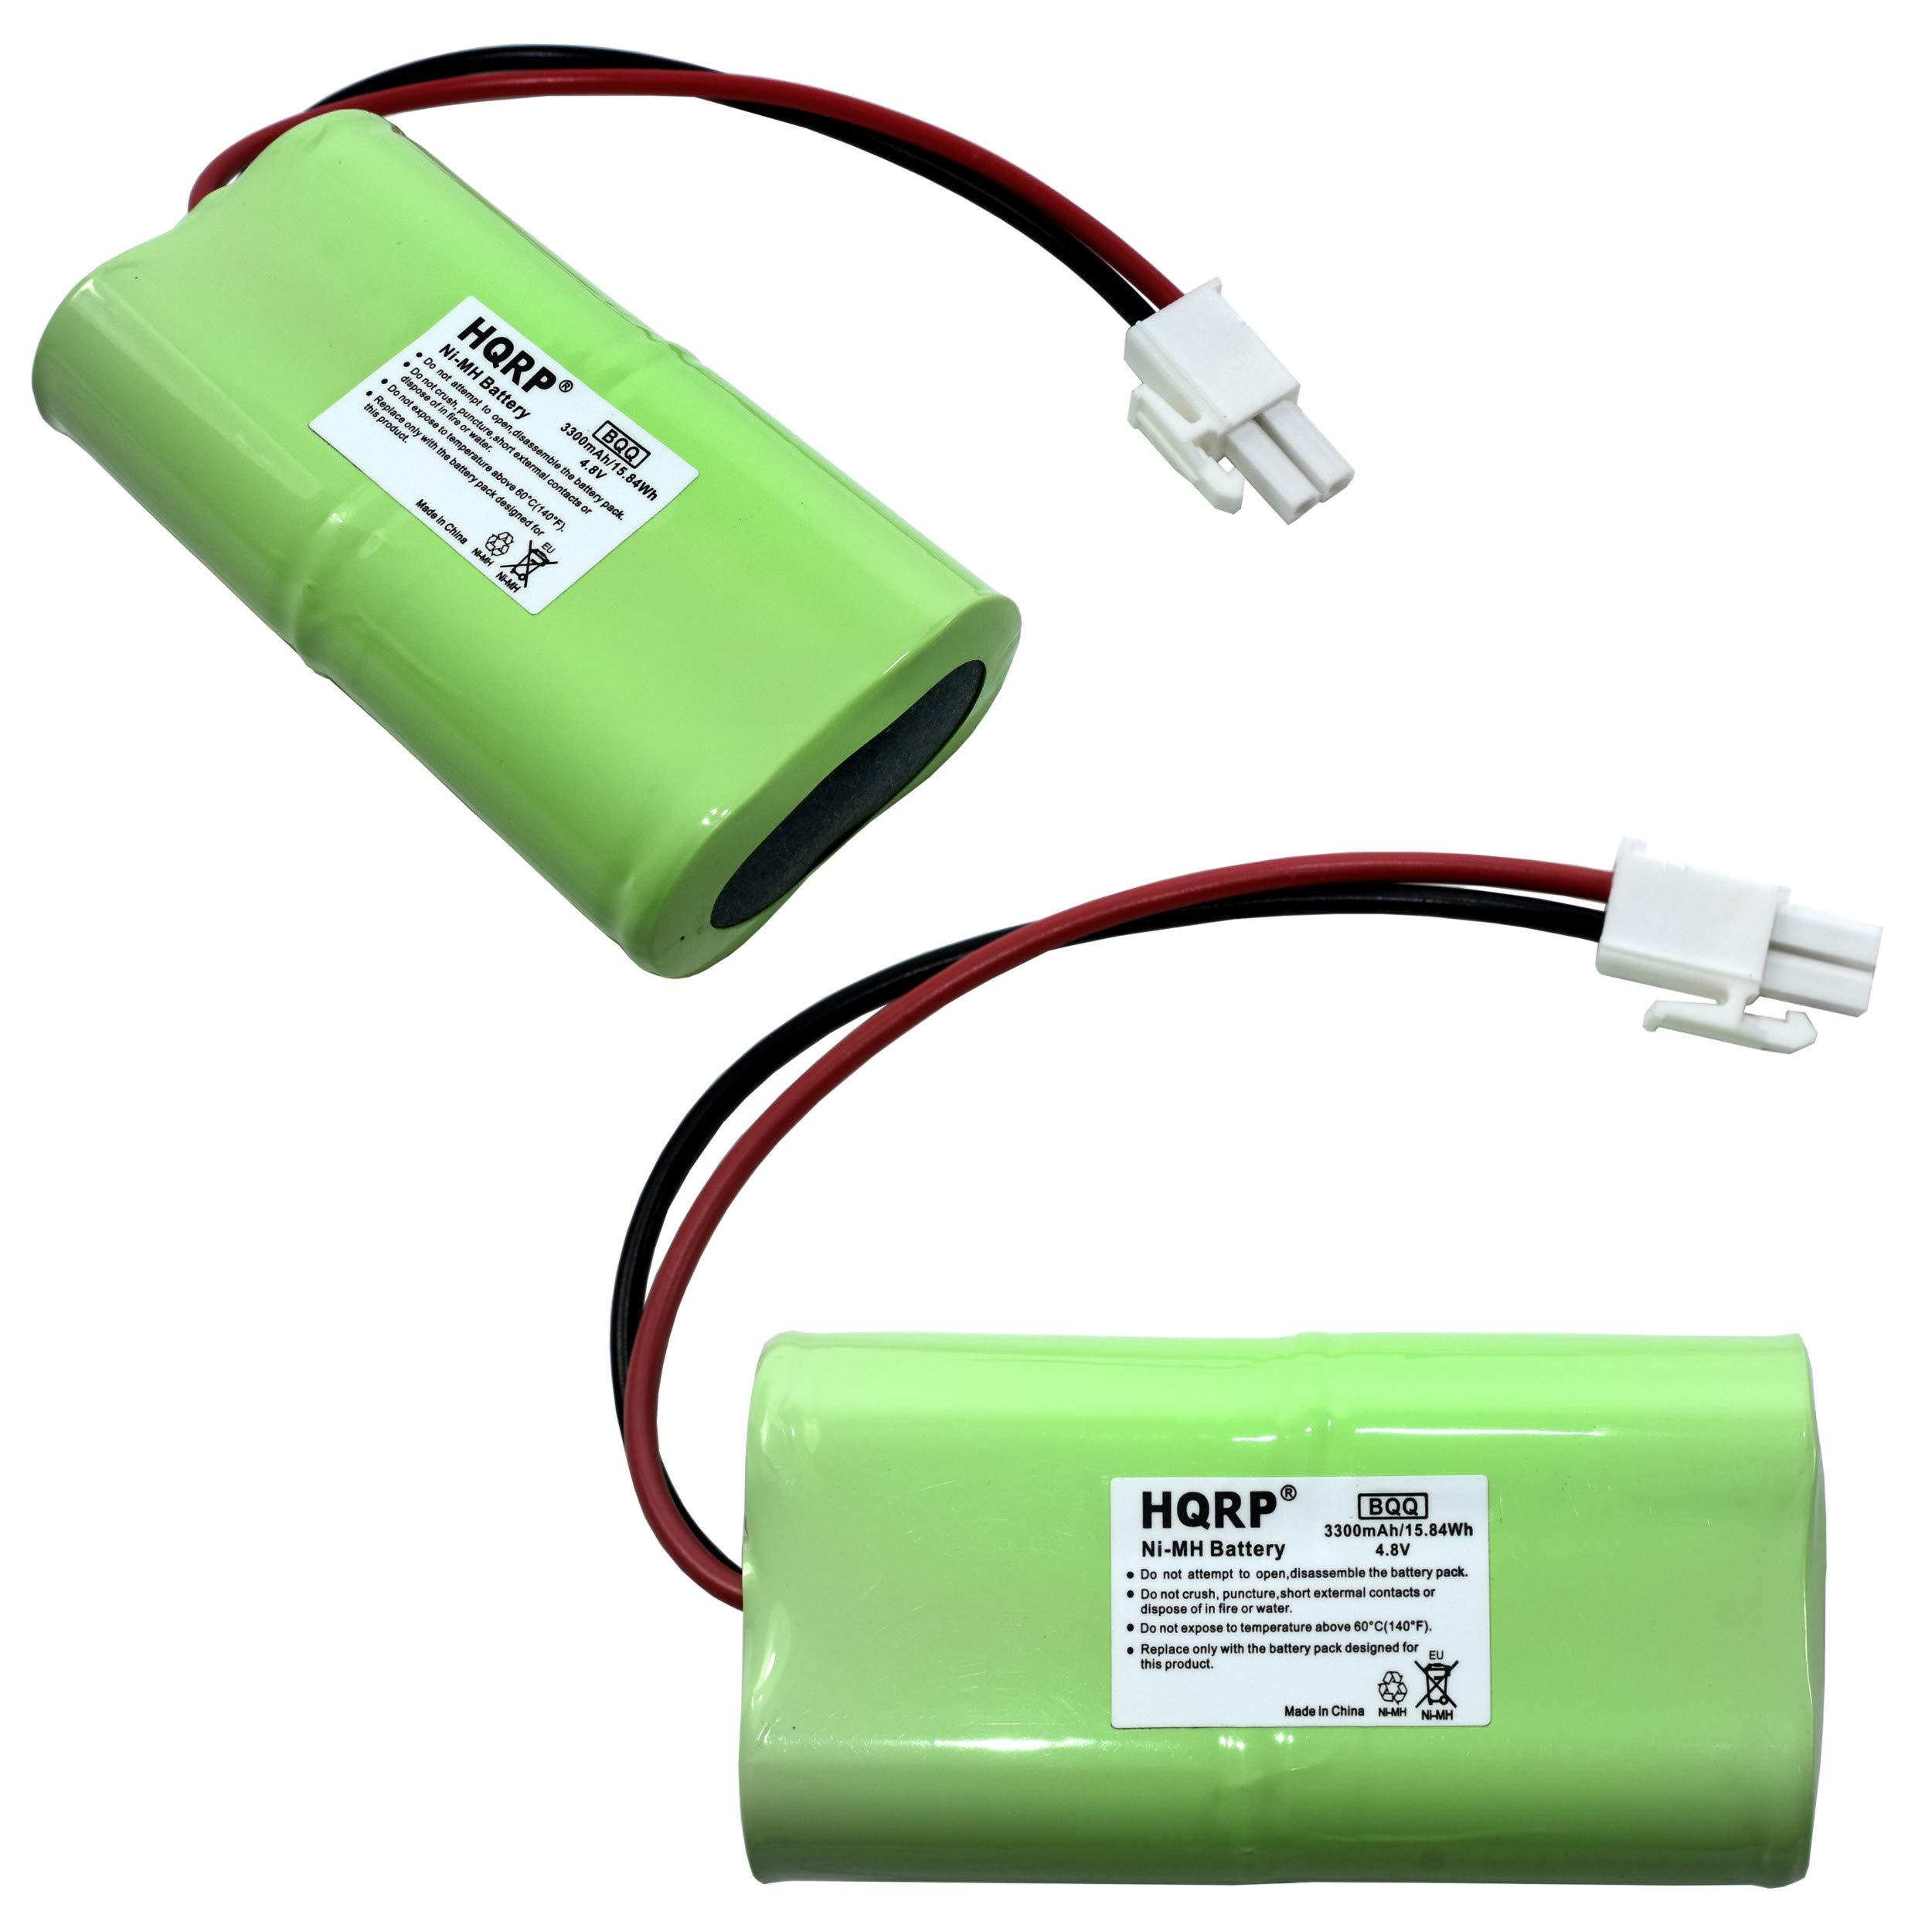 2 Bateria P/ Mosquito Magnet HHD10006 MM565021 Liberty Plus